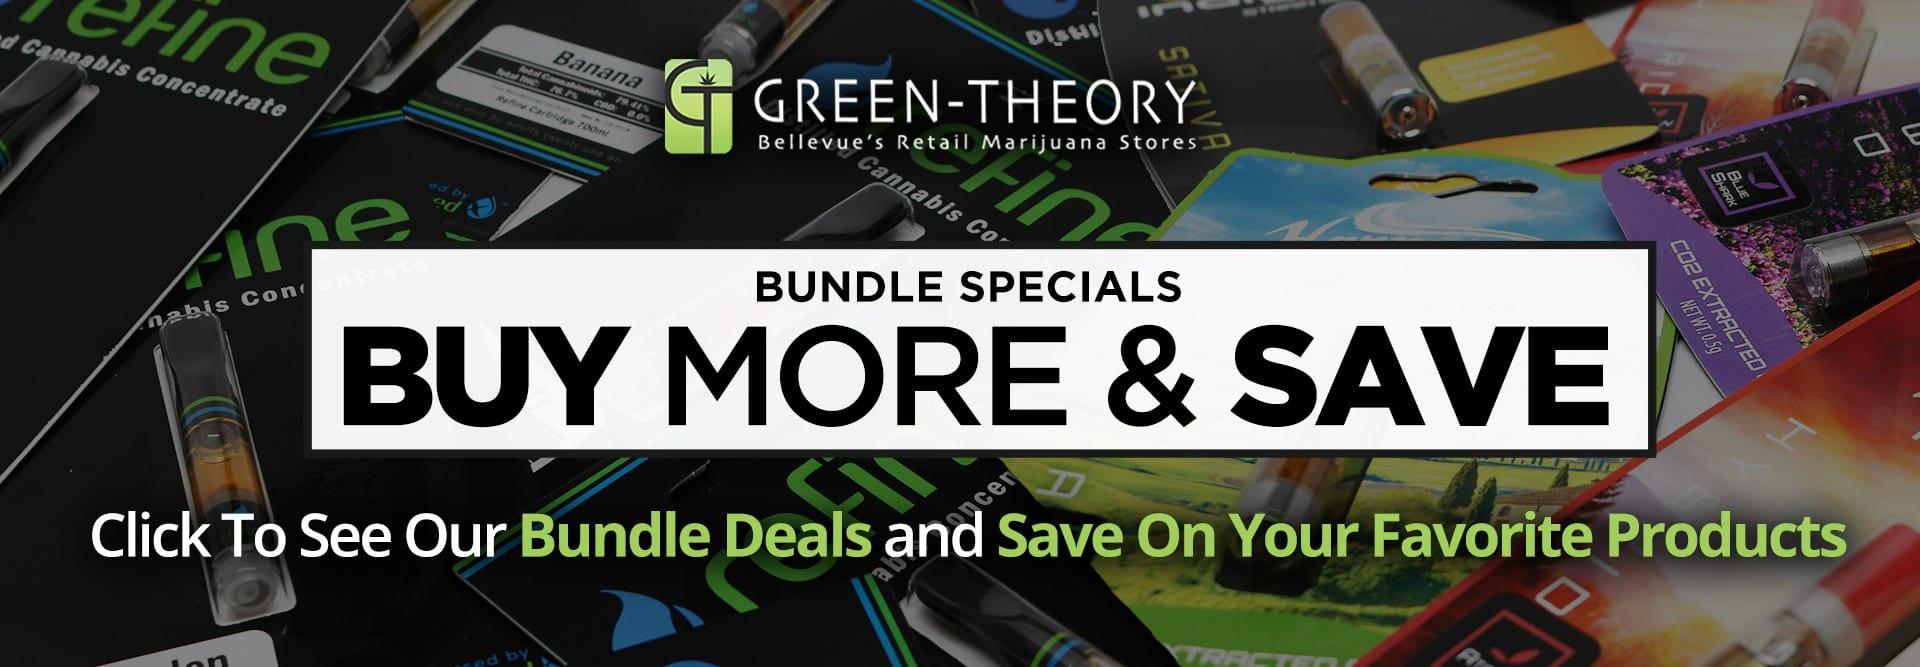 buy-more-and-save-bellevue-marijuana-weed